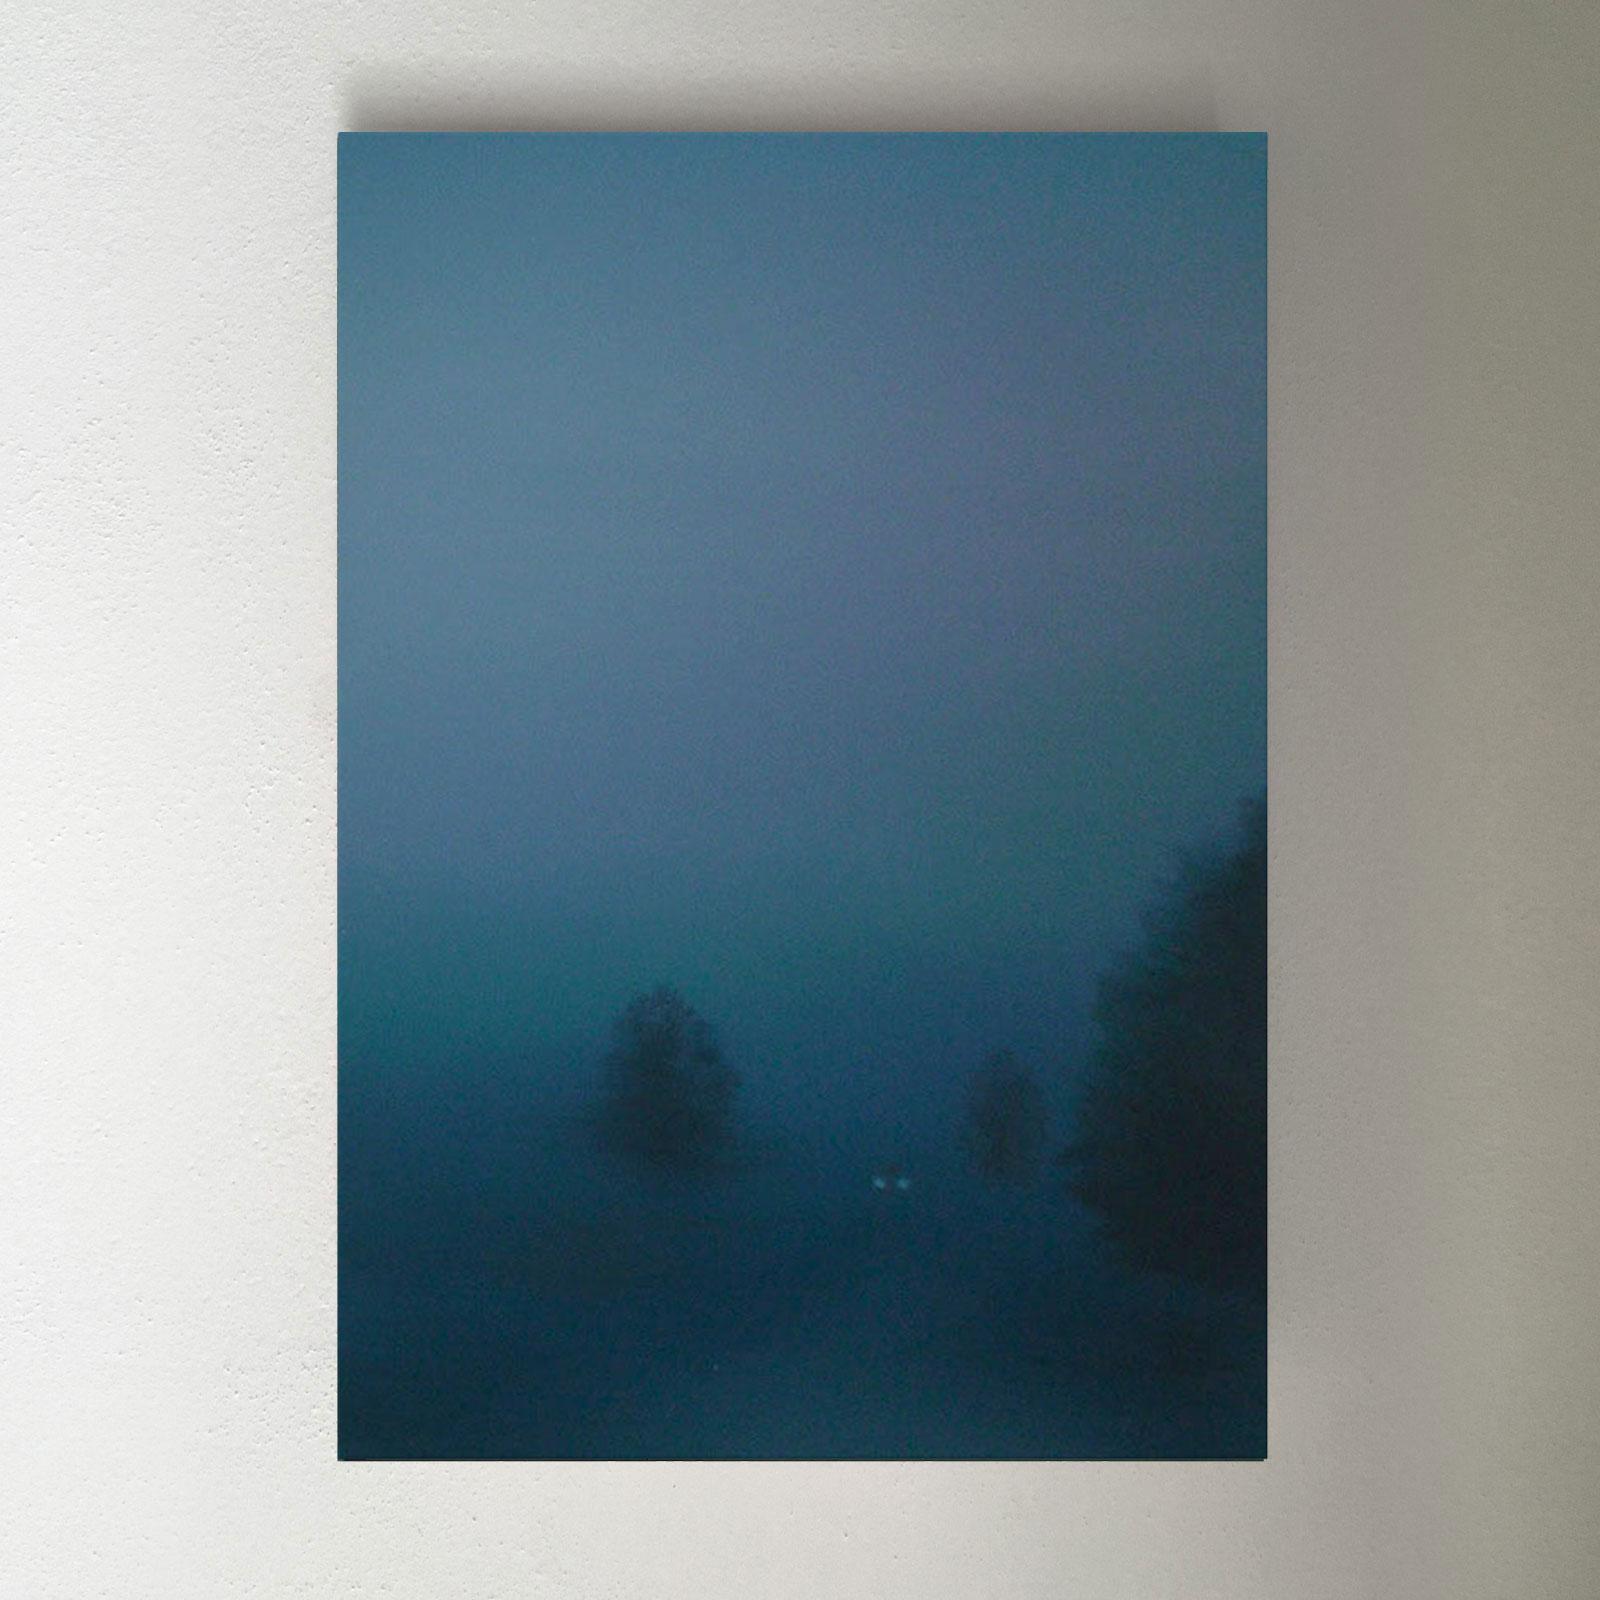 T#09-2008, oil on canvas 100x70cm, priv. coll.